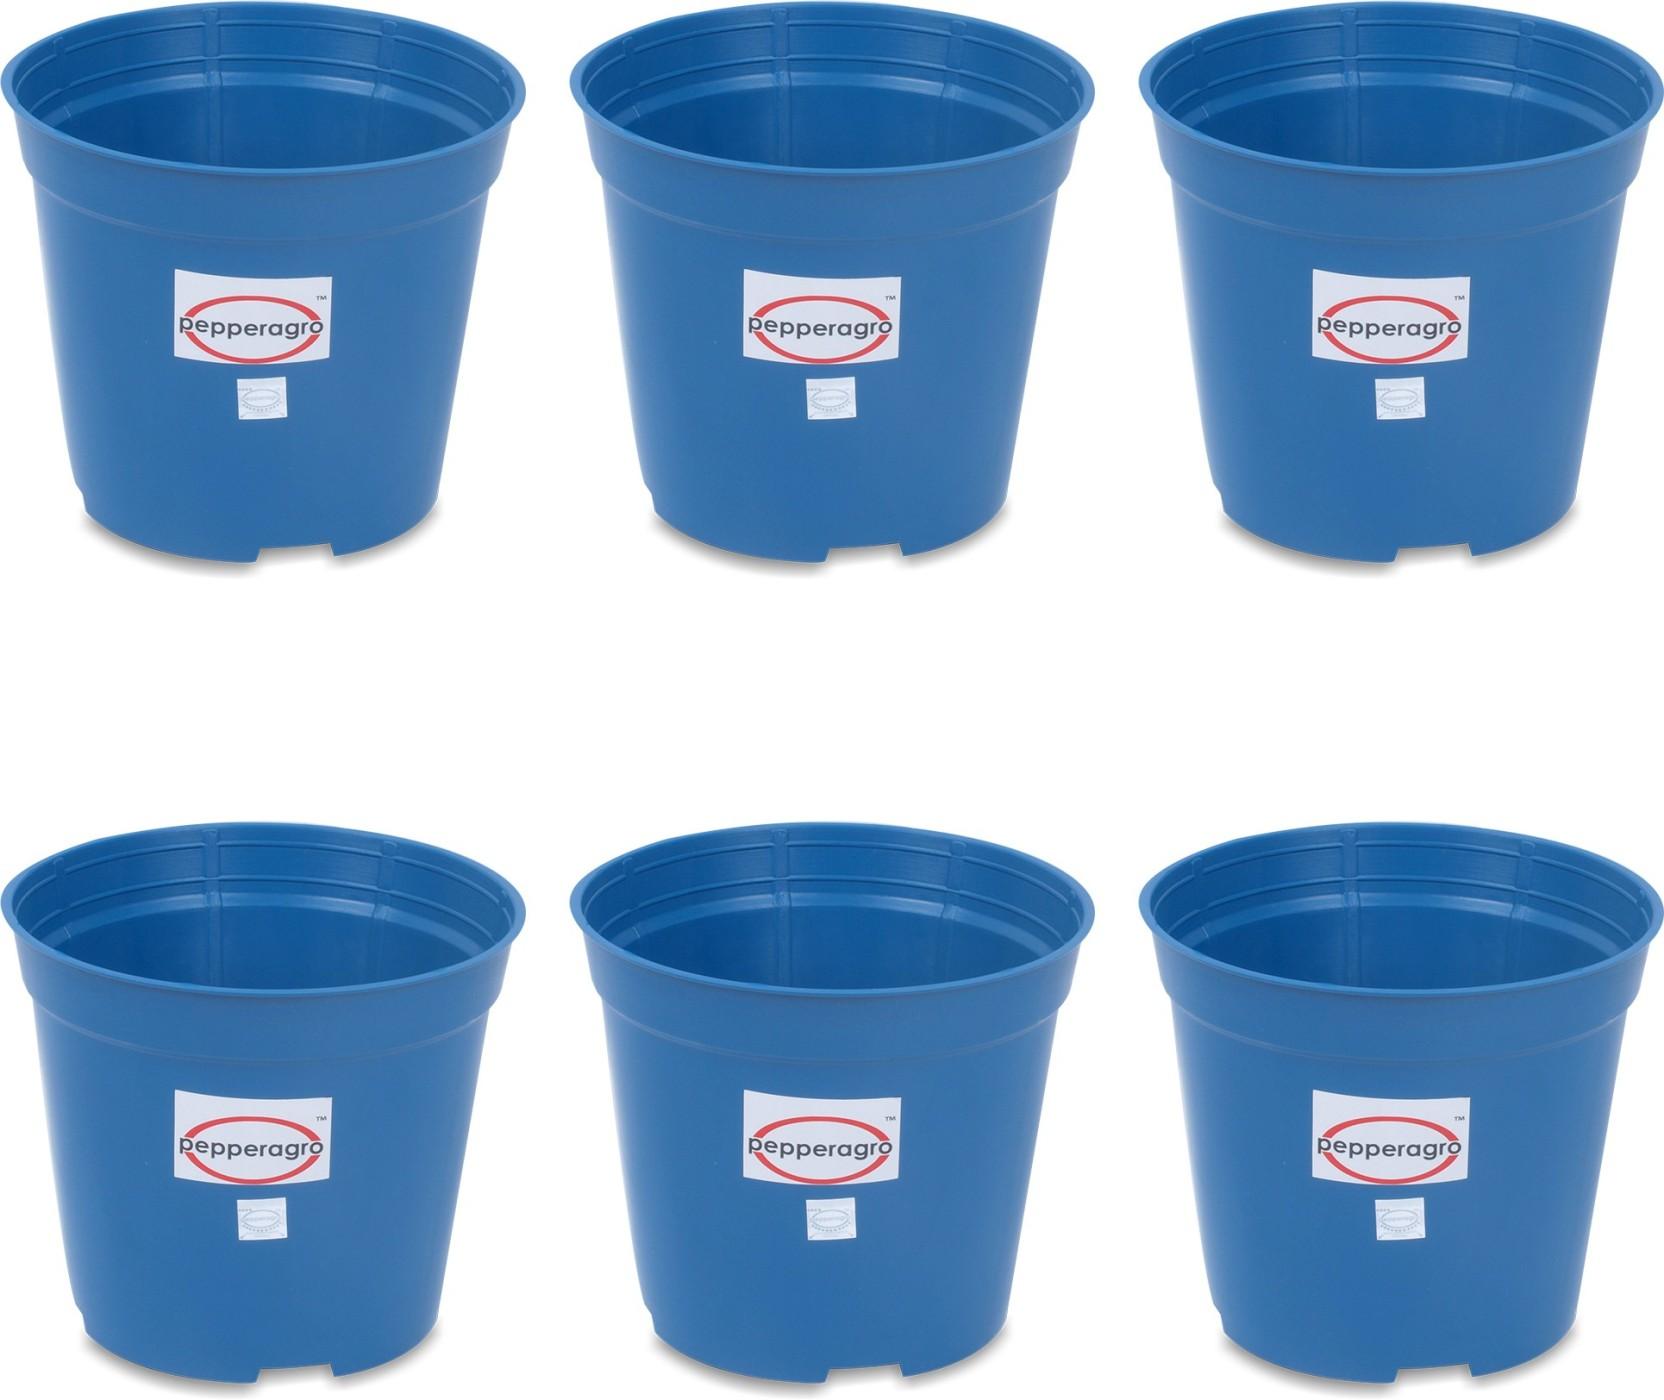 Pepper Agro Gardening Planter Blue Flower Pots 6inch Set Of 6 Plant